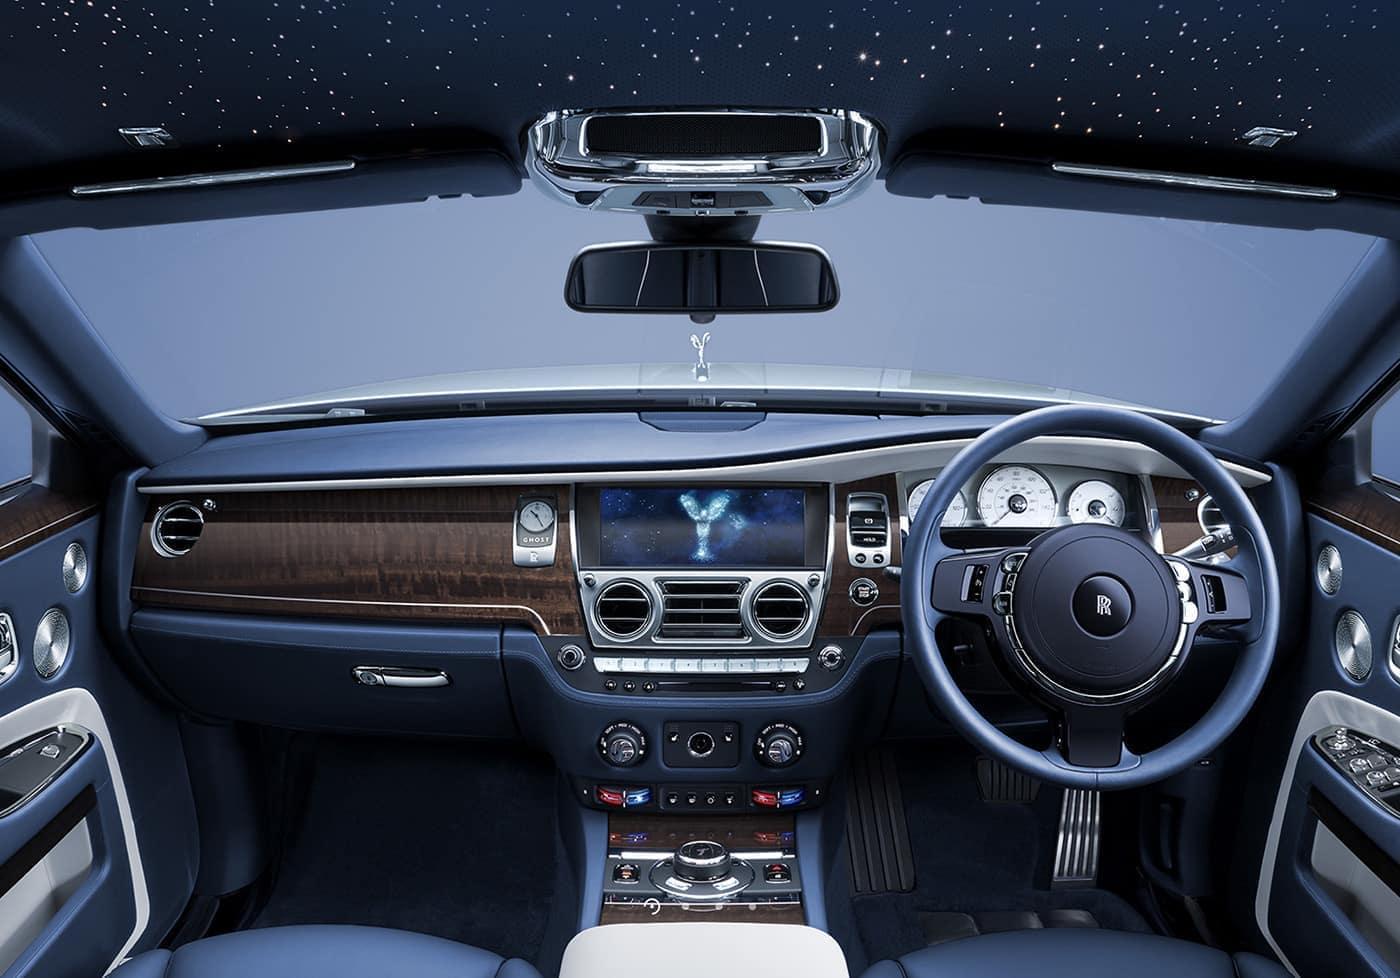 2020 Rolls Royce Ghost Price Rolls Royce Motor Cars Austin